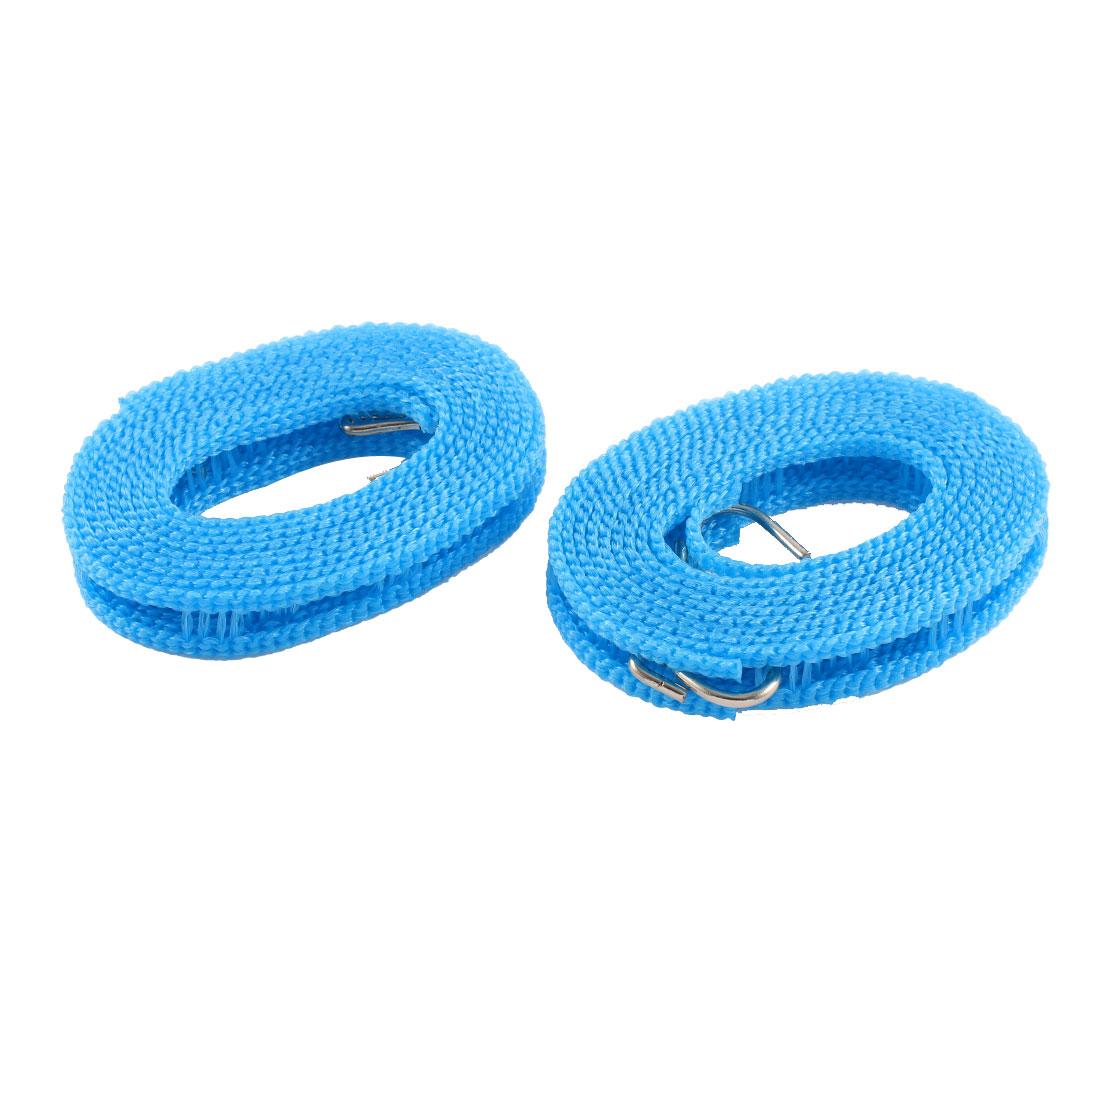 2 Pcs Nylon Nonslip Windproof Dual Hooks Braided Clothesline Hanger Blue 2M